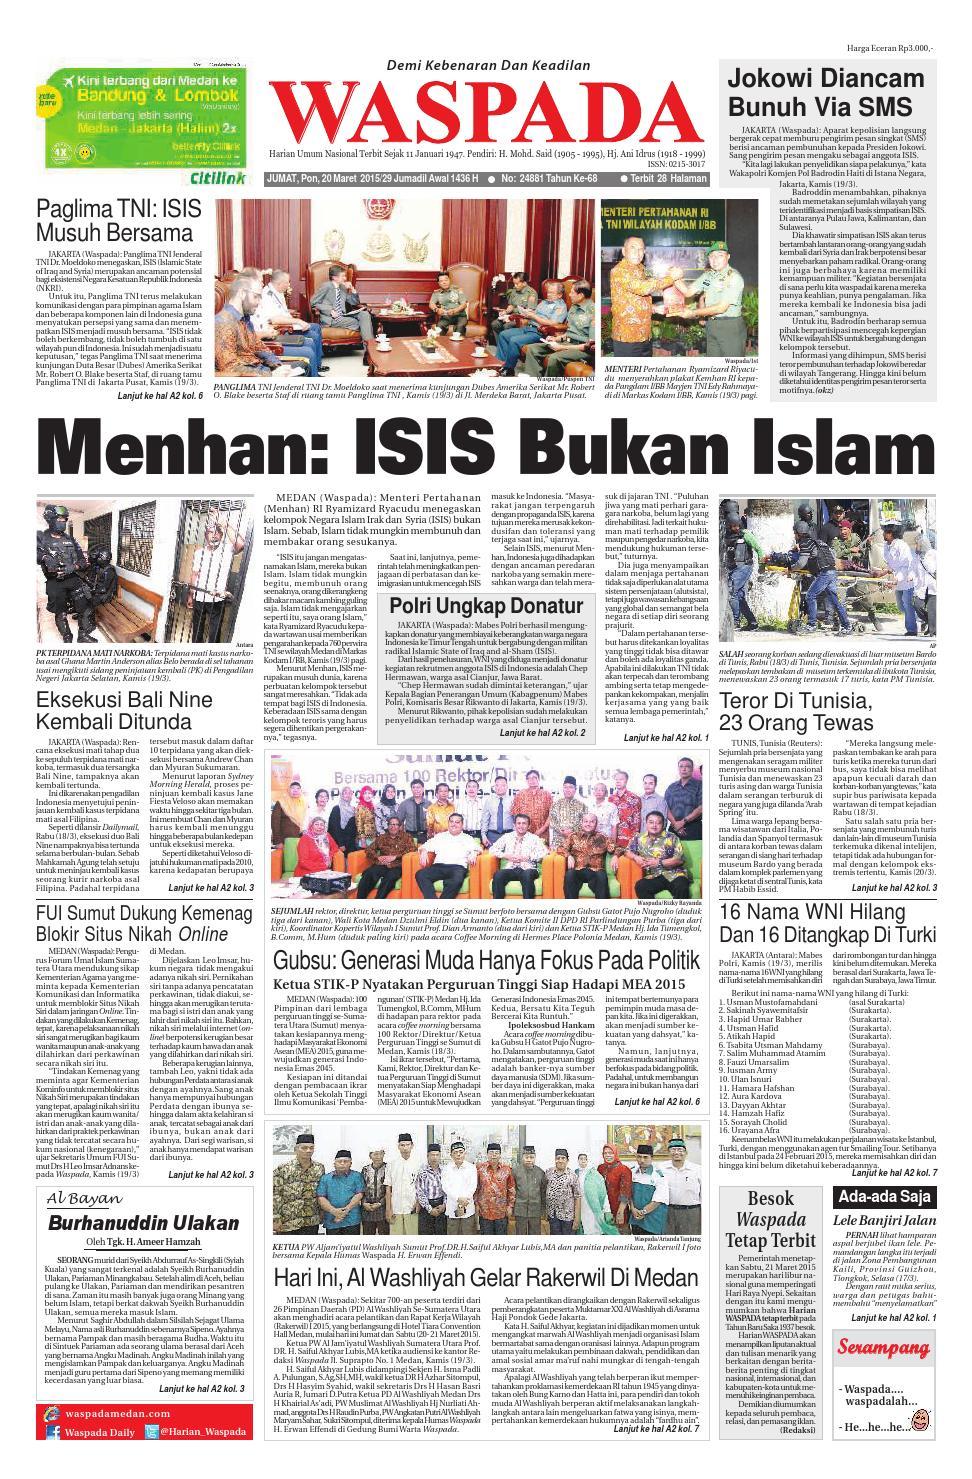 Waspada Jumat 20 Maret 2015 By Harian Issuu Produk Ukm Bumn Madu Super Az Zikra